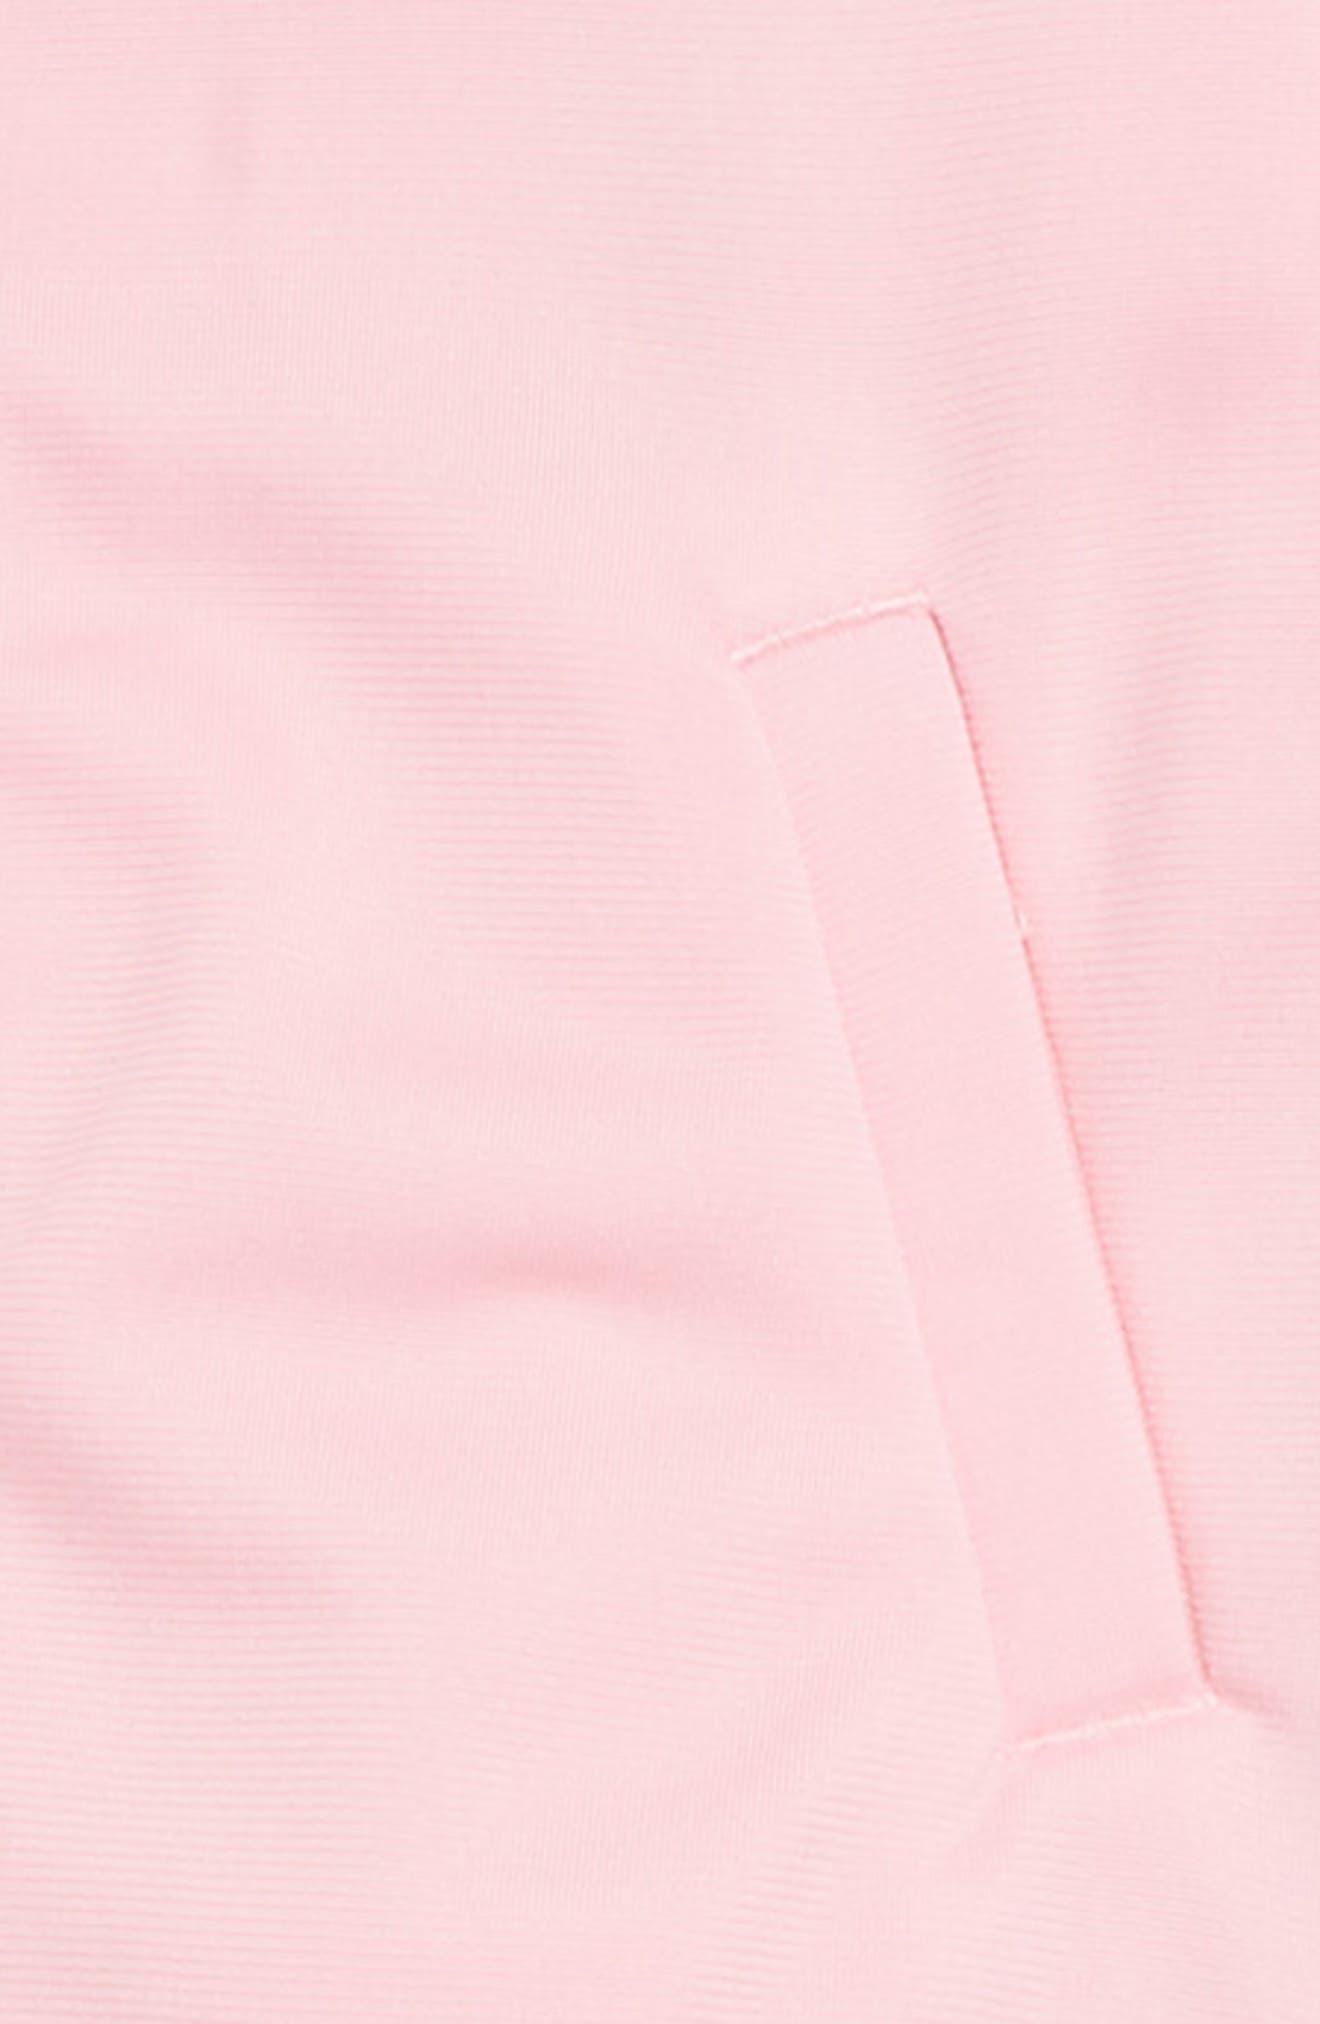 Superstar Track Jacket & Pants Gift Set,                             Alternate thumbnail 2, color,                             PINK/ WHITE